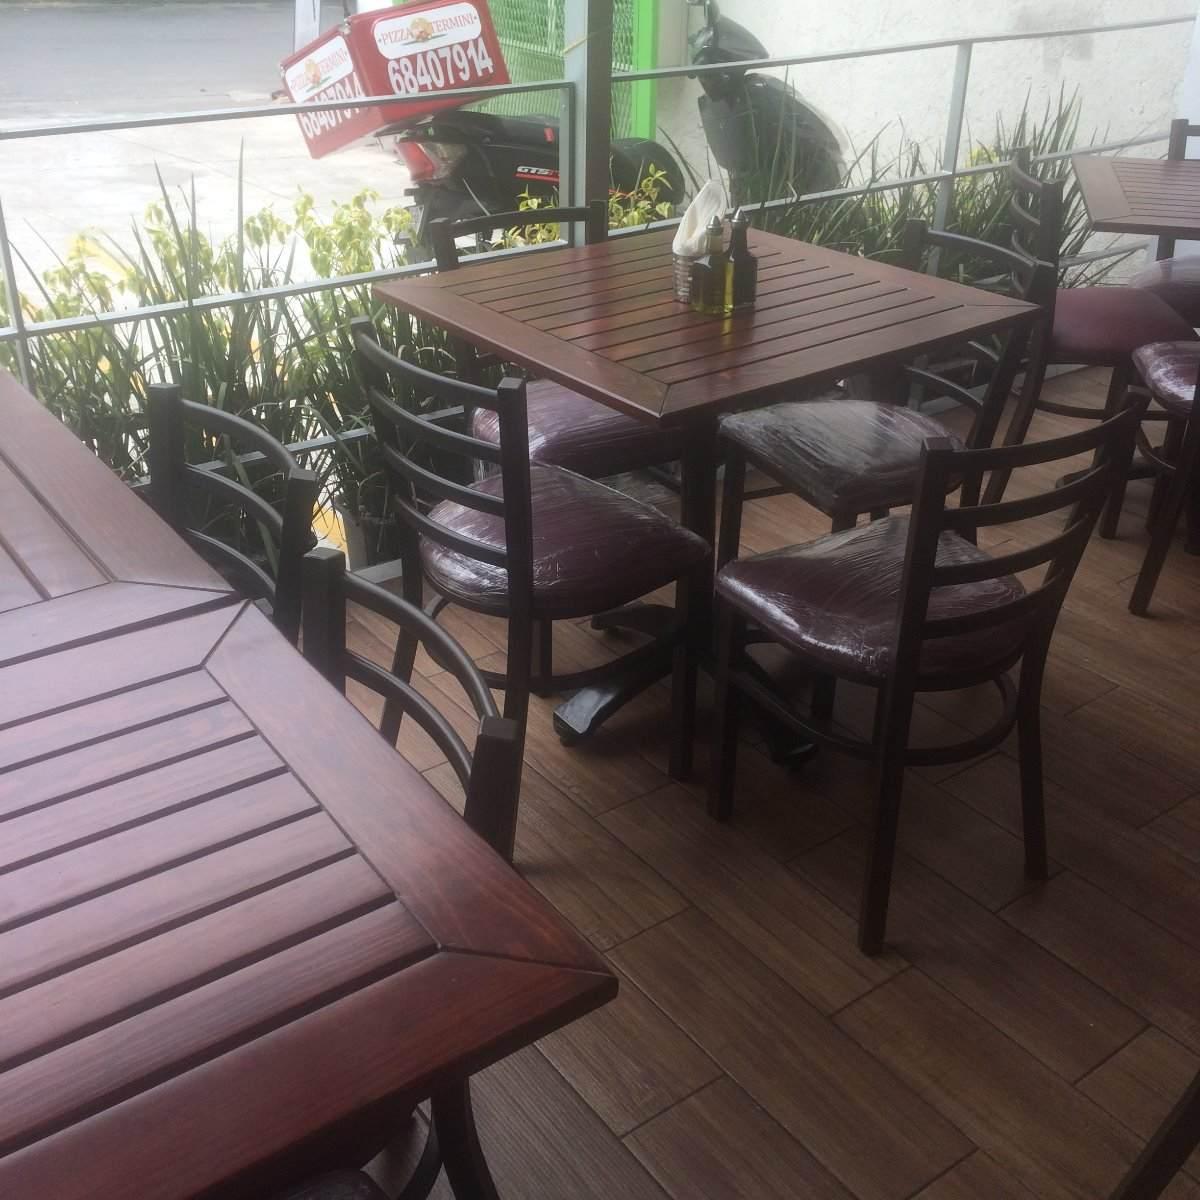 Mesasy sillas para restaurante bar cafeterias 3 - Sillas para cafeterias ...